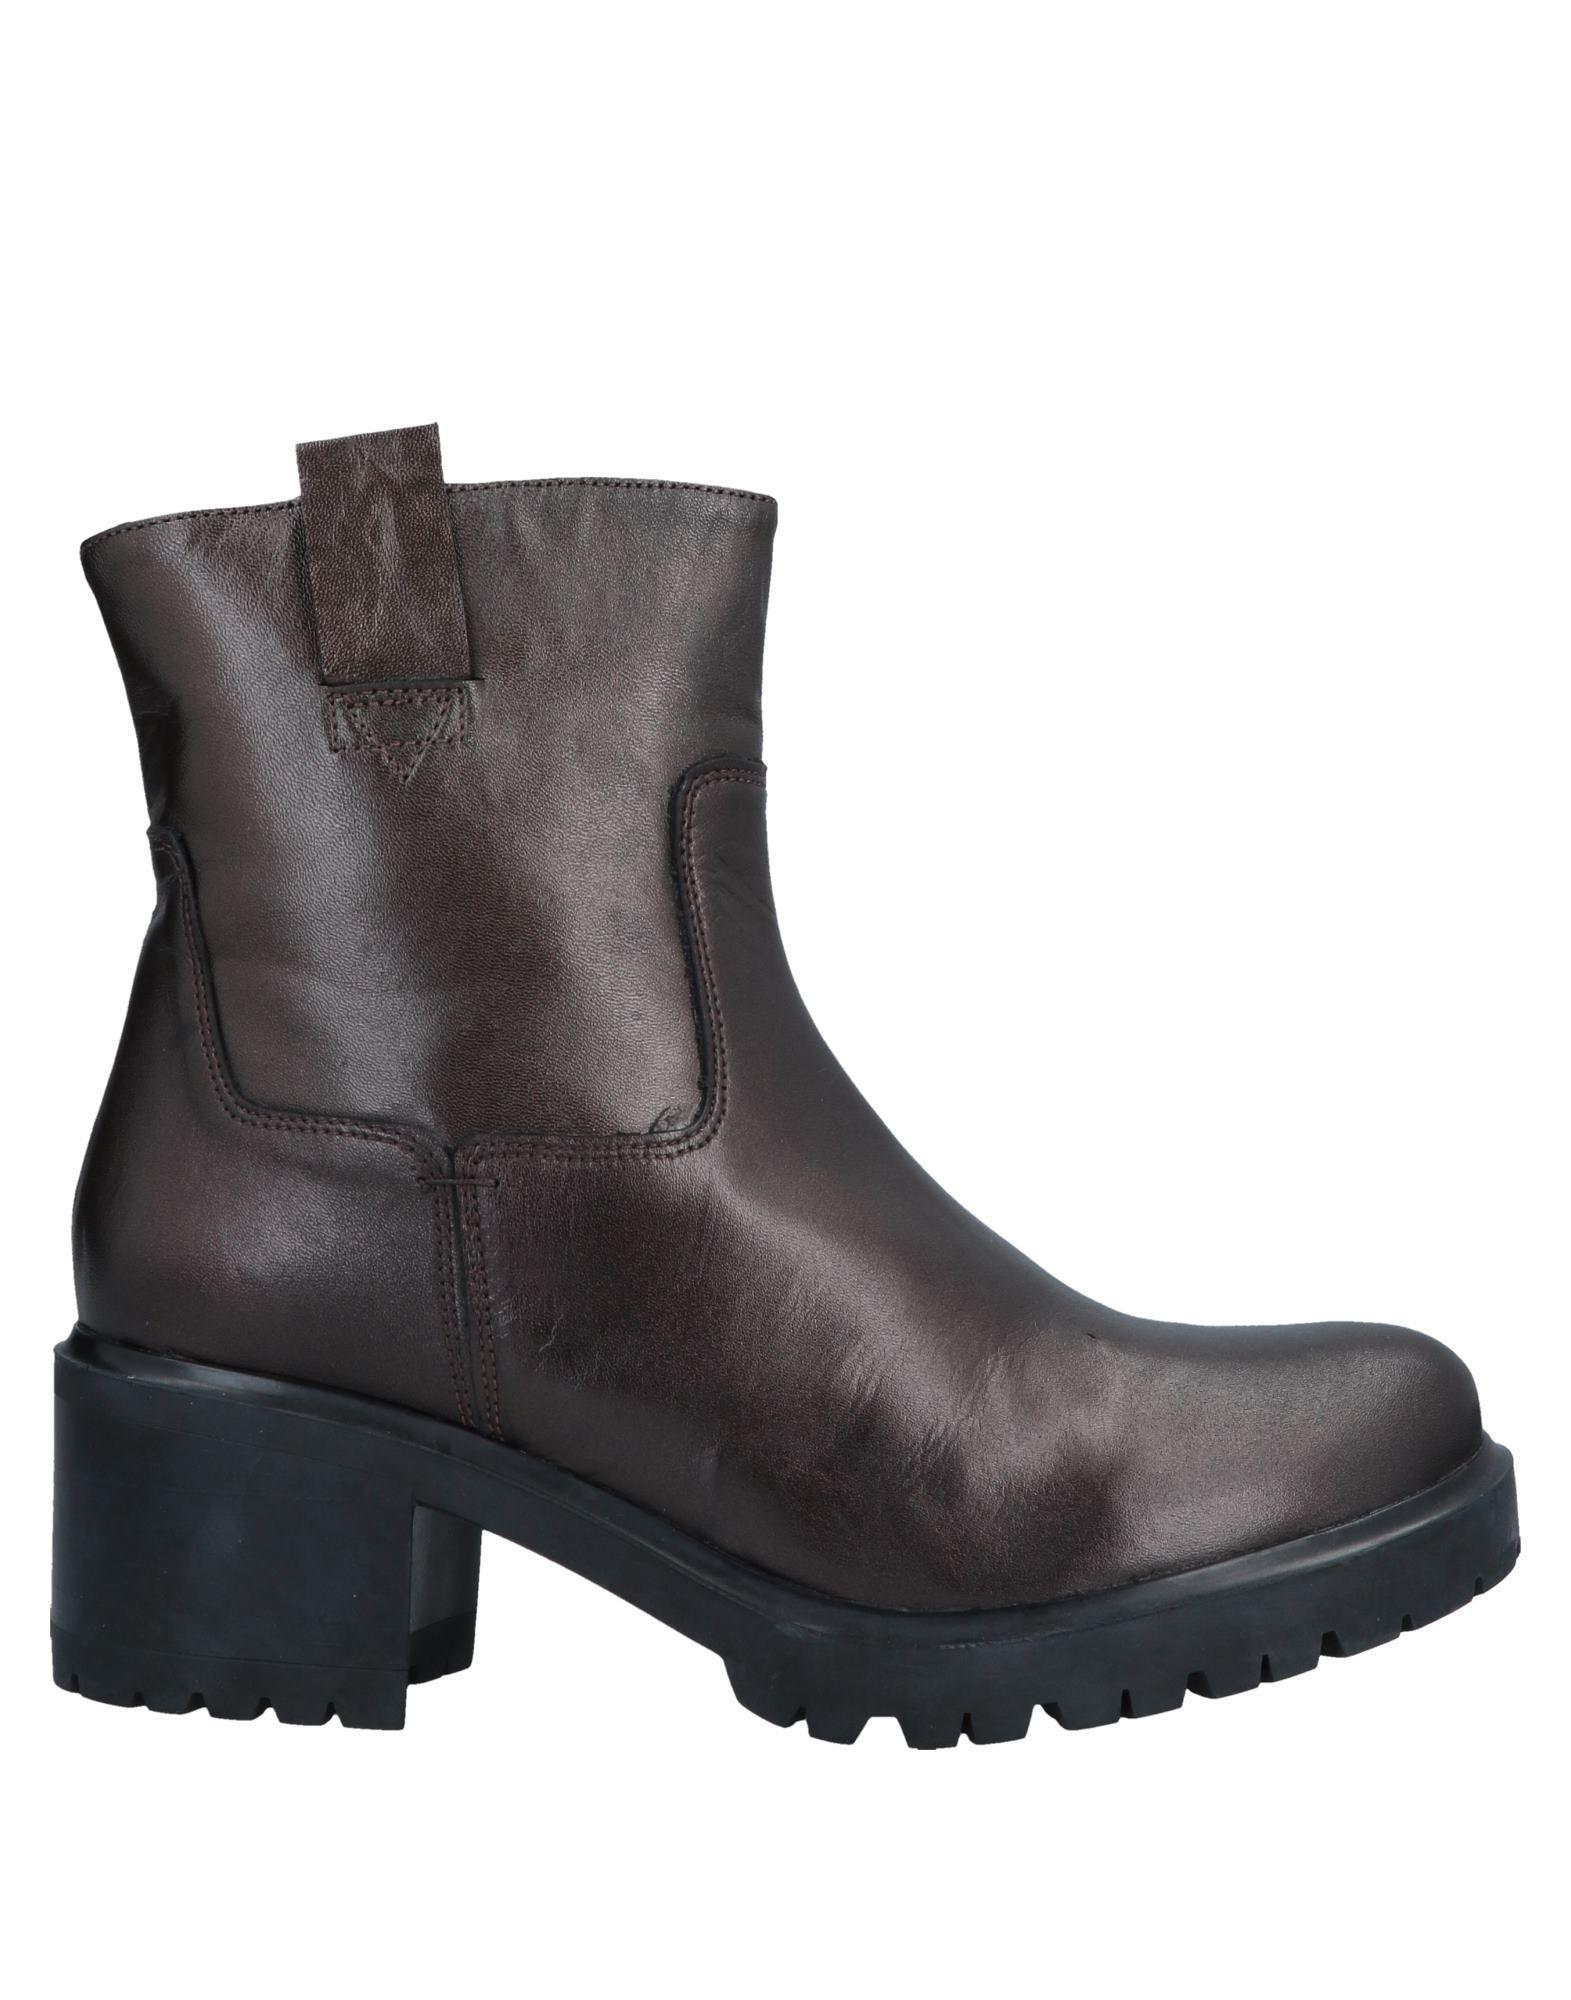 MERCANTE DI FIORI Полусапоги и высокие ботинки ботинки fiori